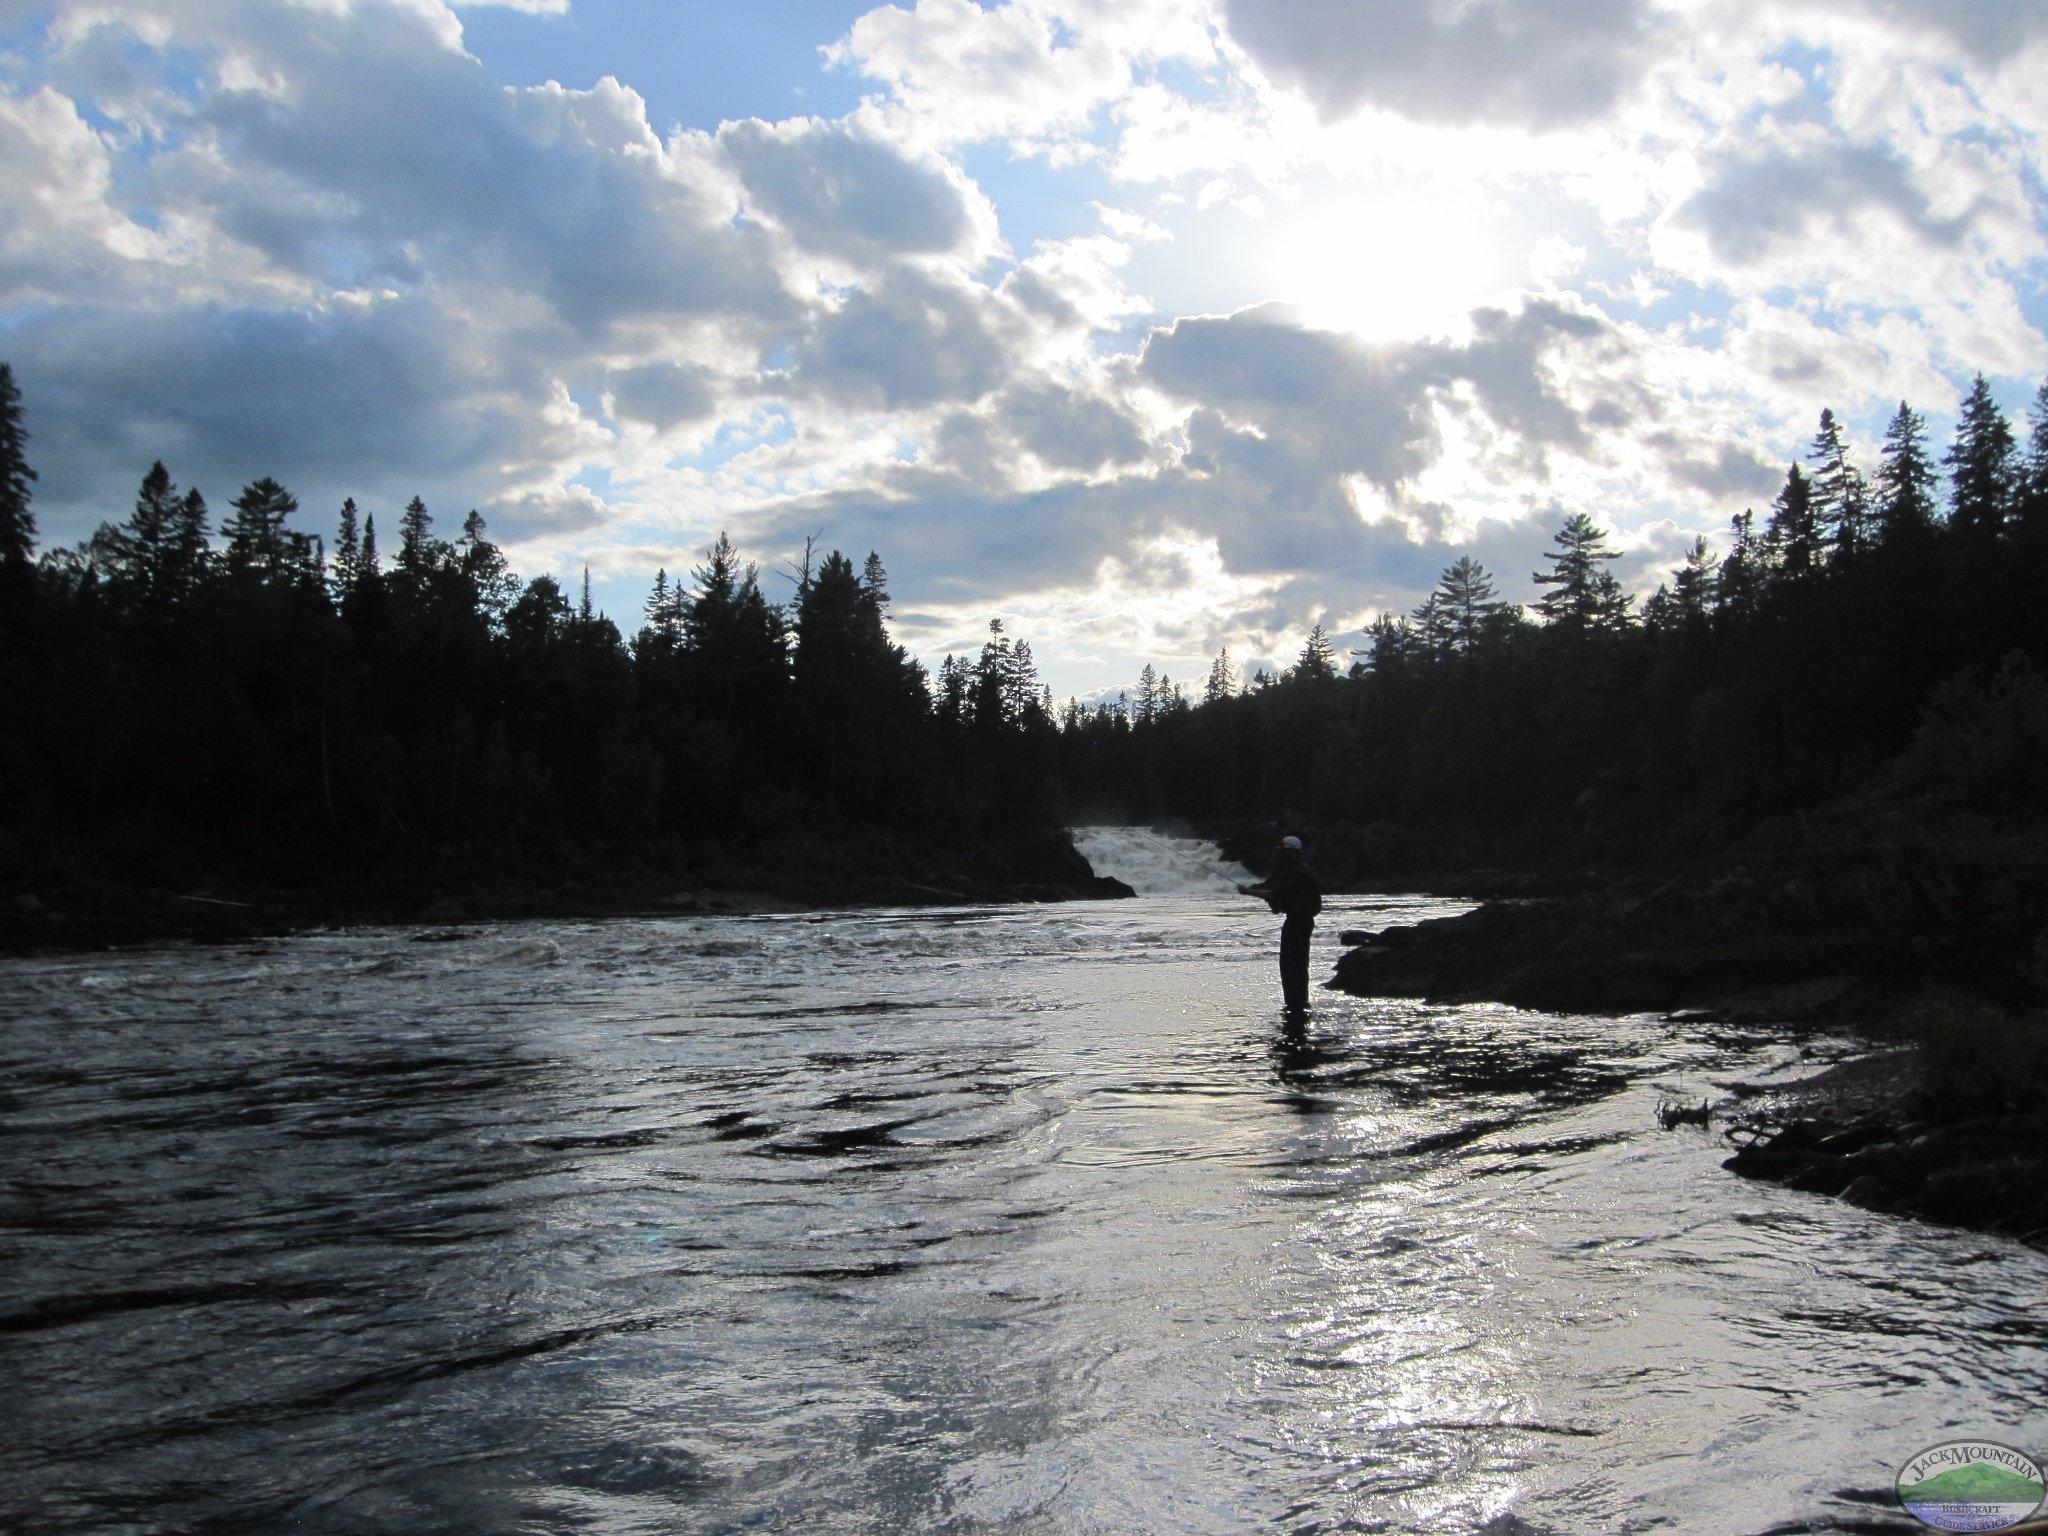 Fishing below Allagash falls on a remote canoe trip under a dramatic Aroostook County sky.